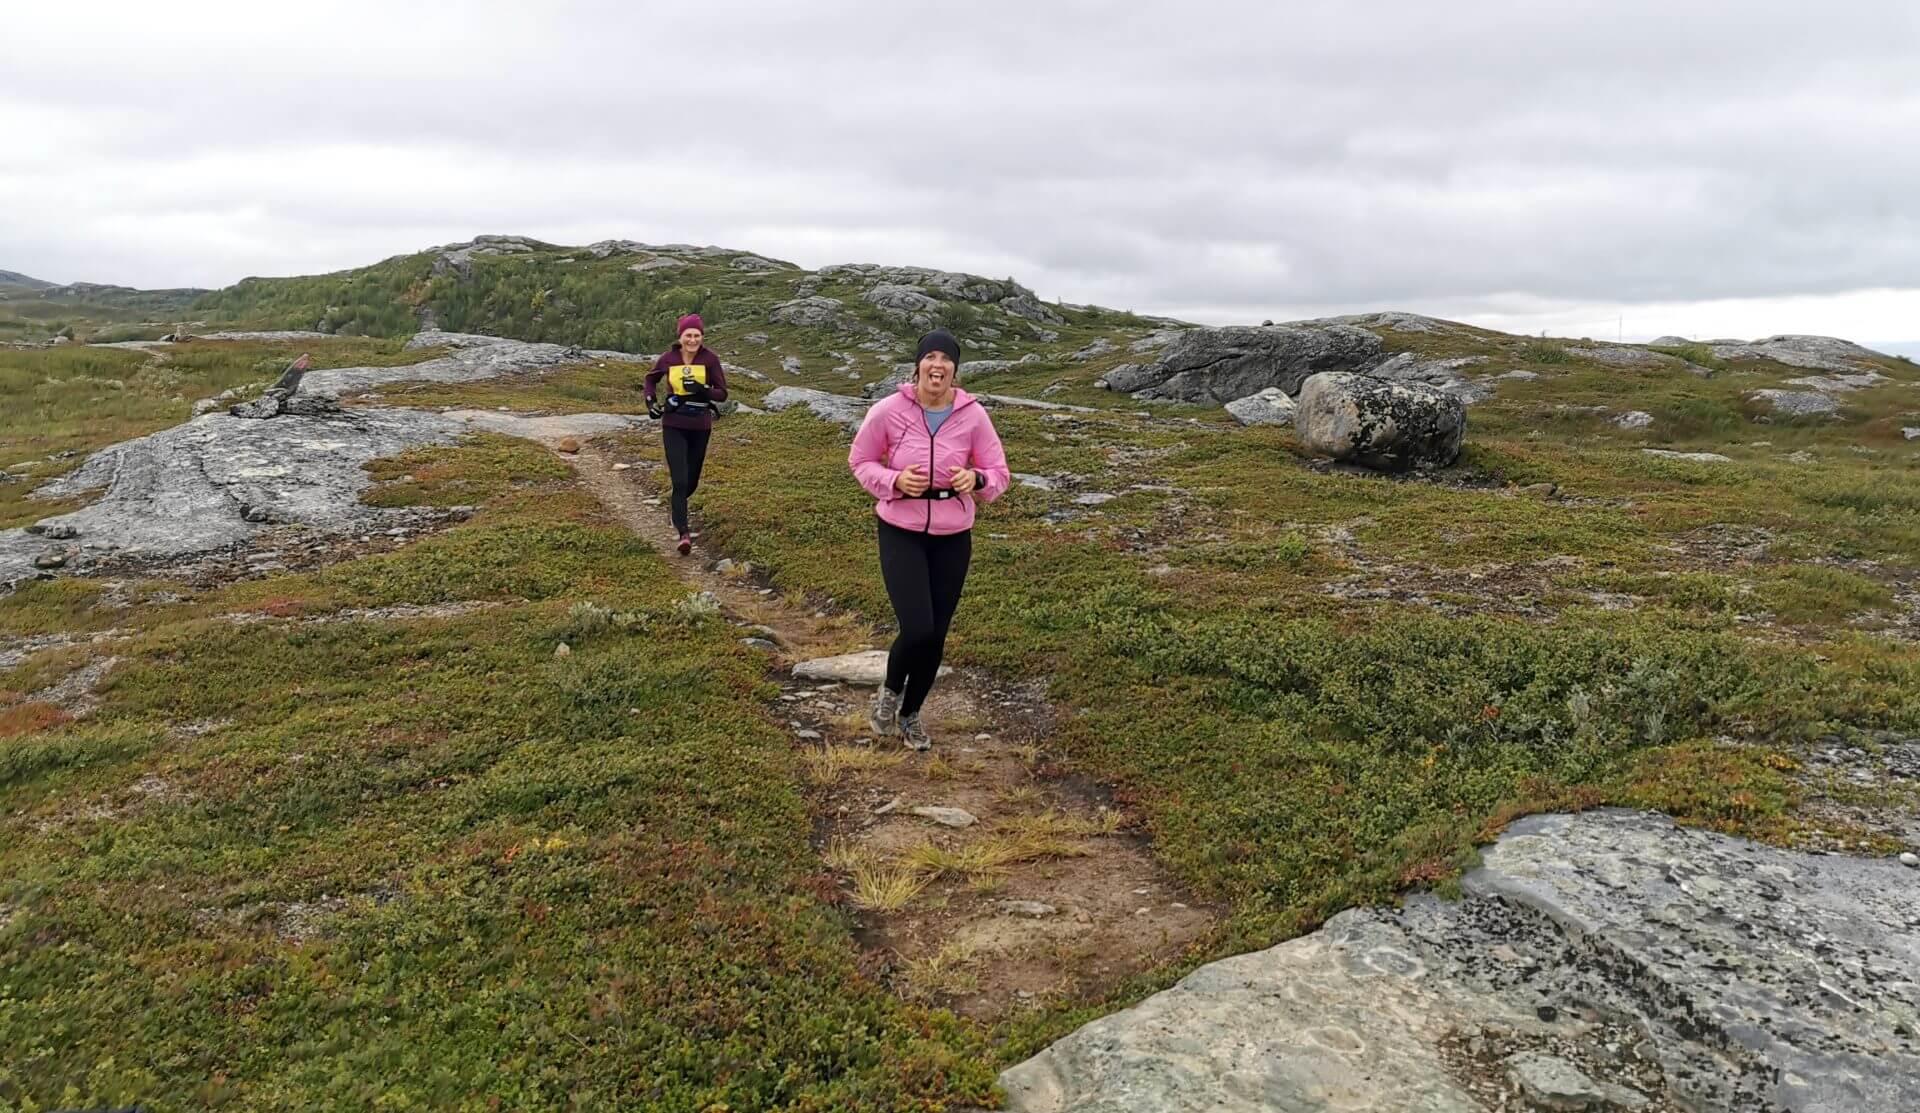 Arctic Circle Race 2019 Polcirkelloppet Guijaure kontr rosa jacka